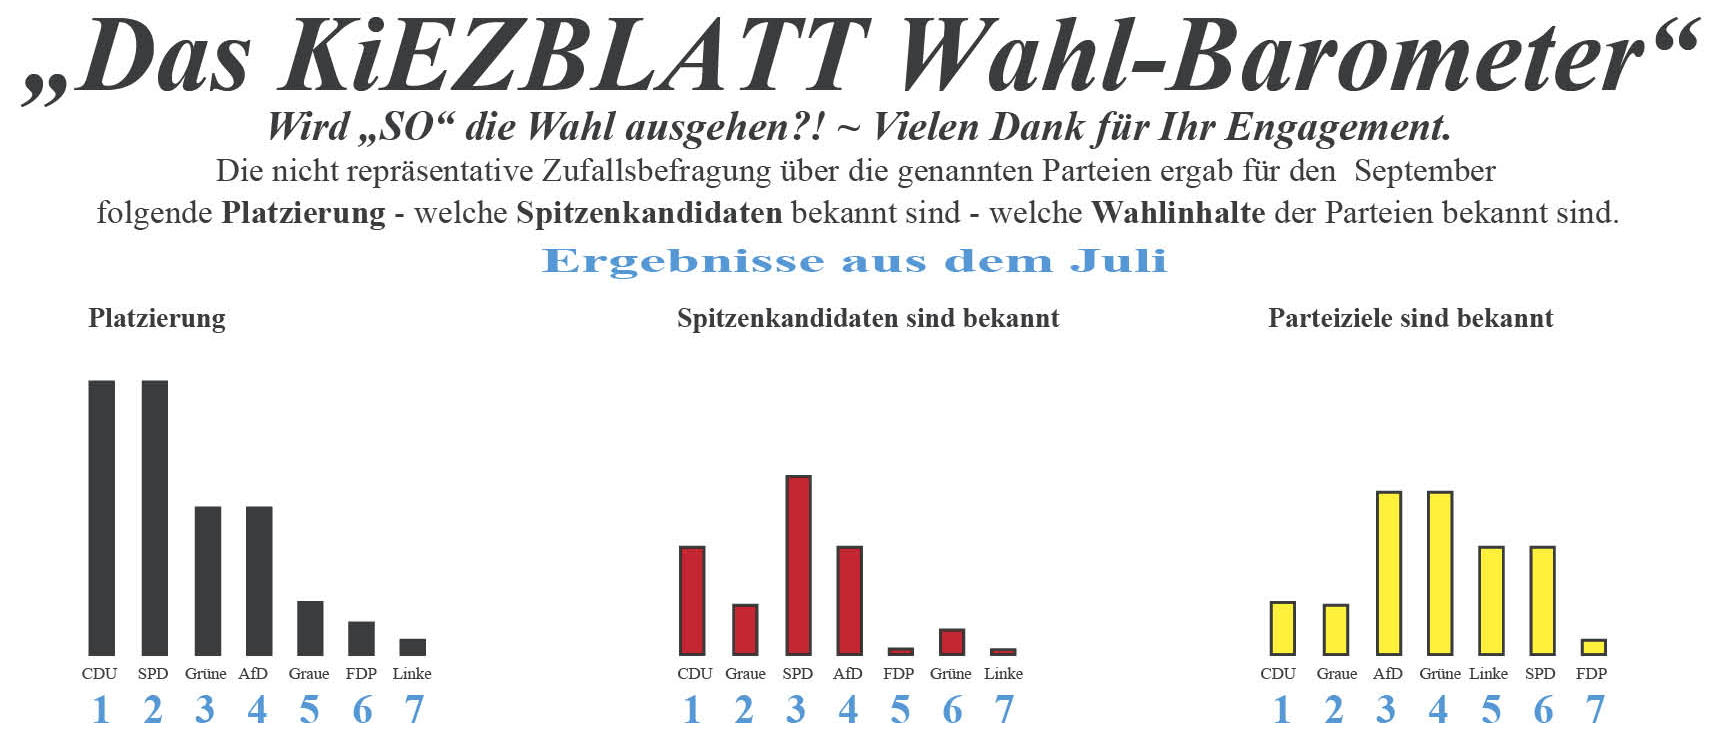 137 wp 07 Kiezblatt wahl.barometer